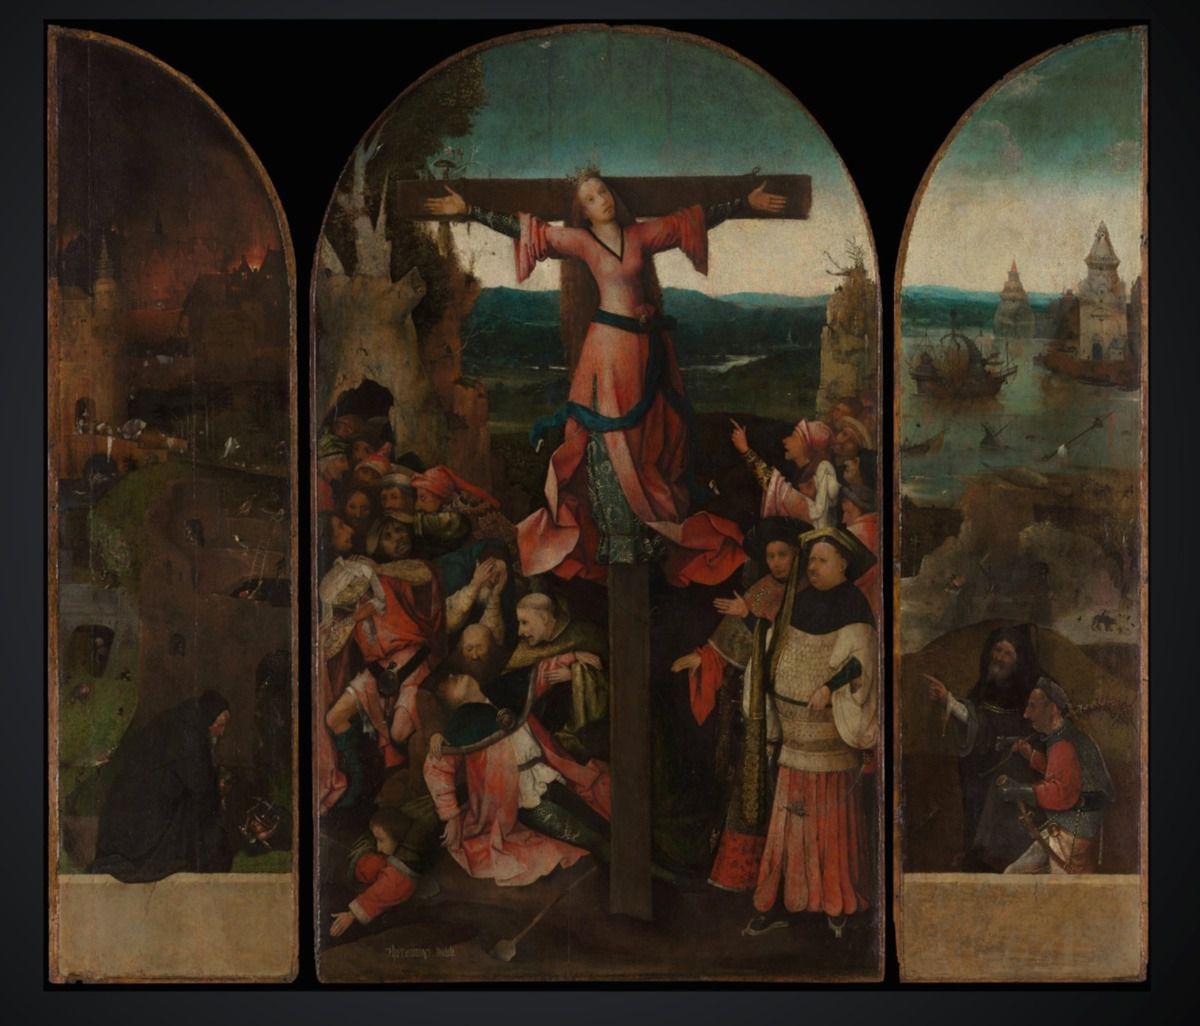 Hyeronimus Bosch, Visions of the Hereafter. Ascent into Heaven (entre 1505 et 1515) ; Santa Liberata, Triptyque